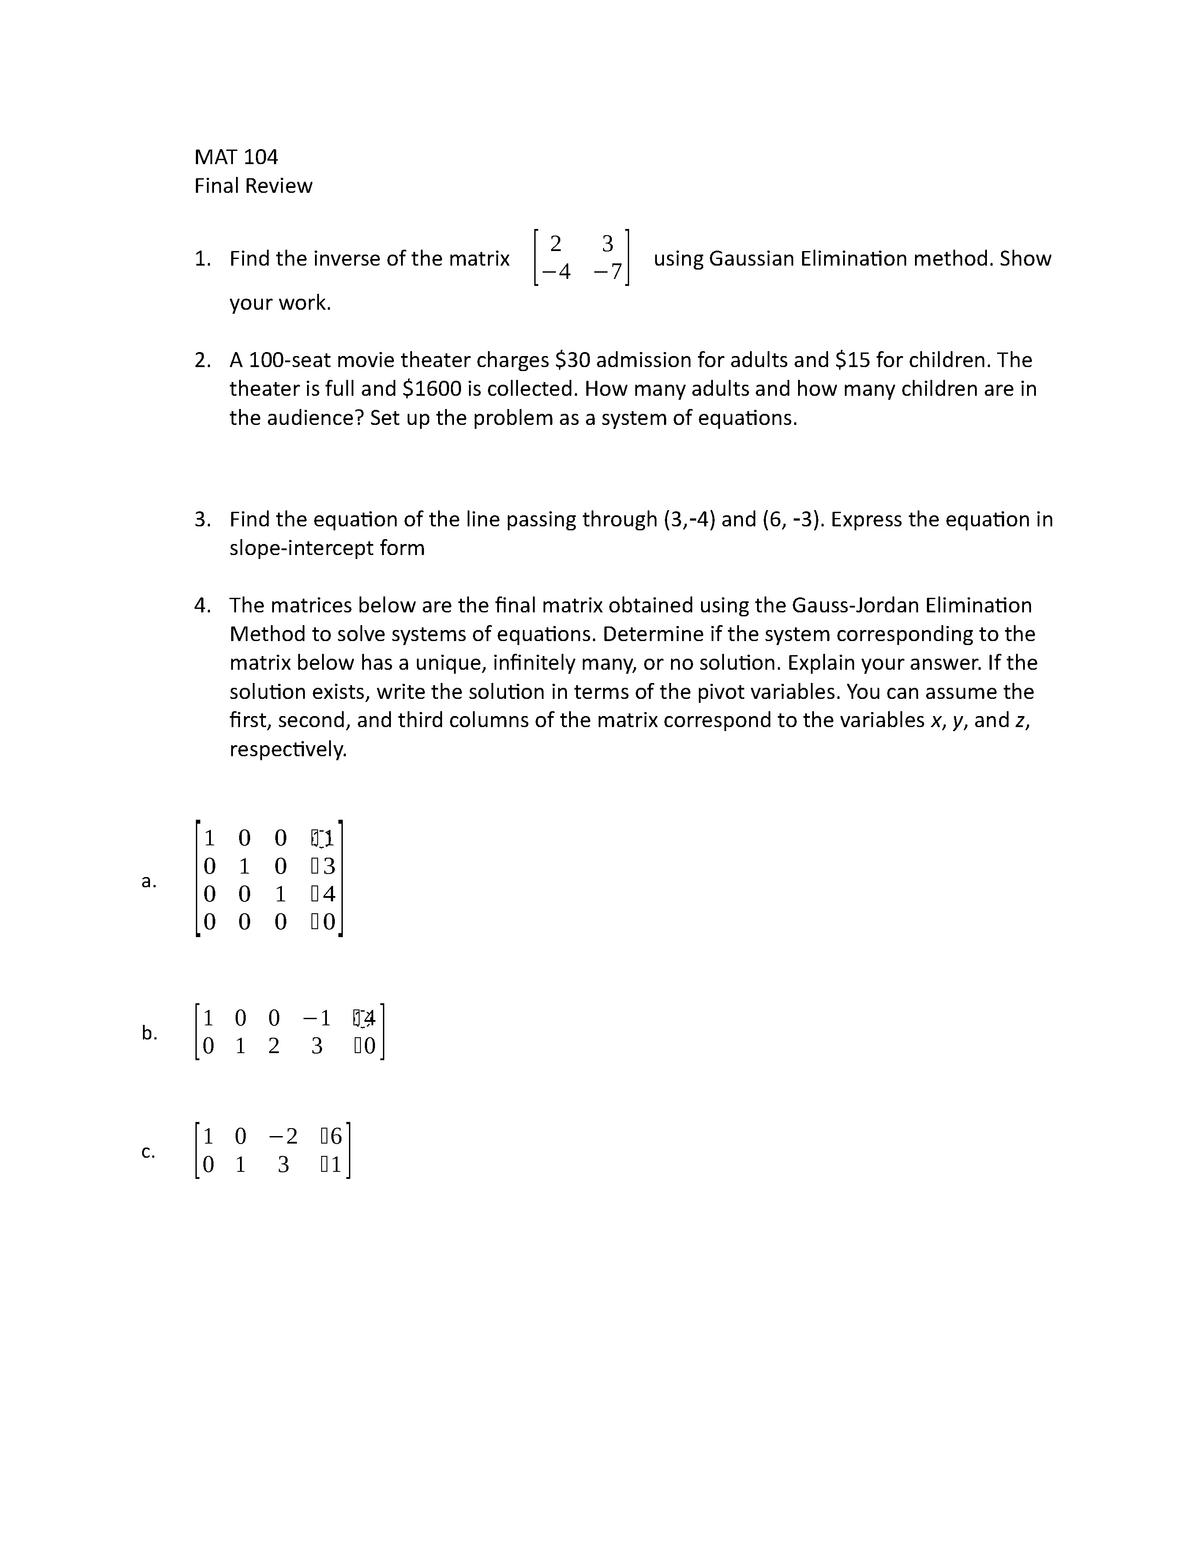 MAT 104 Final Review - MAT 104 Finite Mathematics - StuDocu